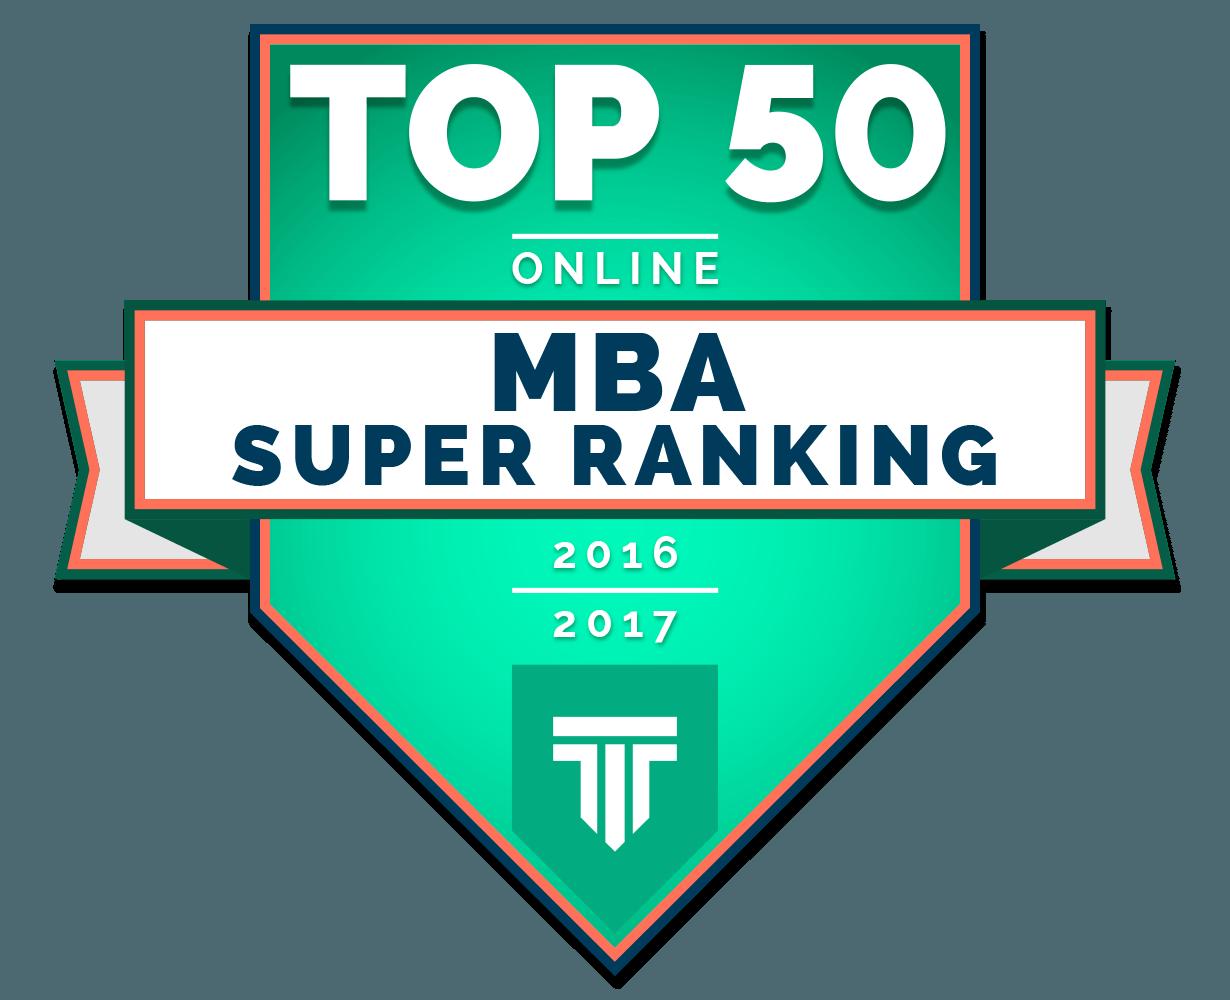 Top 50 Online MBA Super Ranking 2016-2017